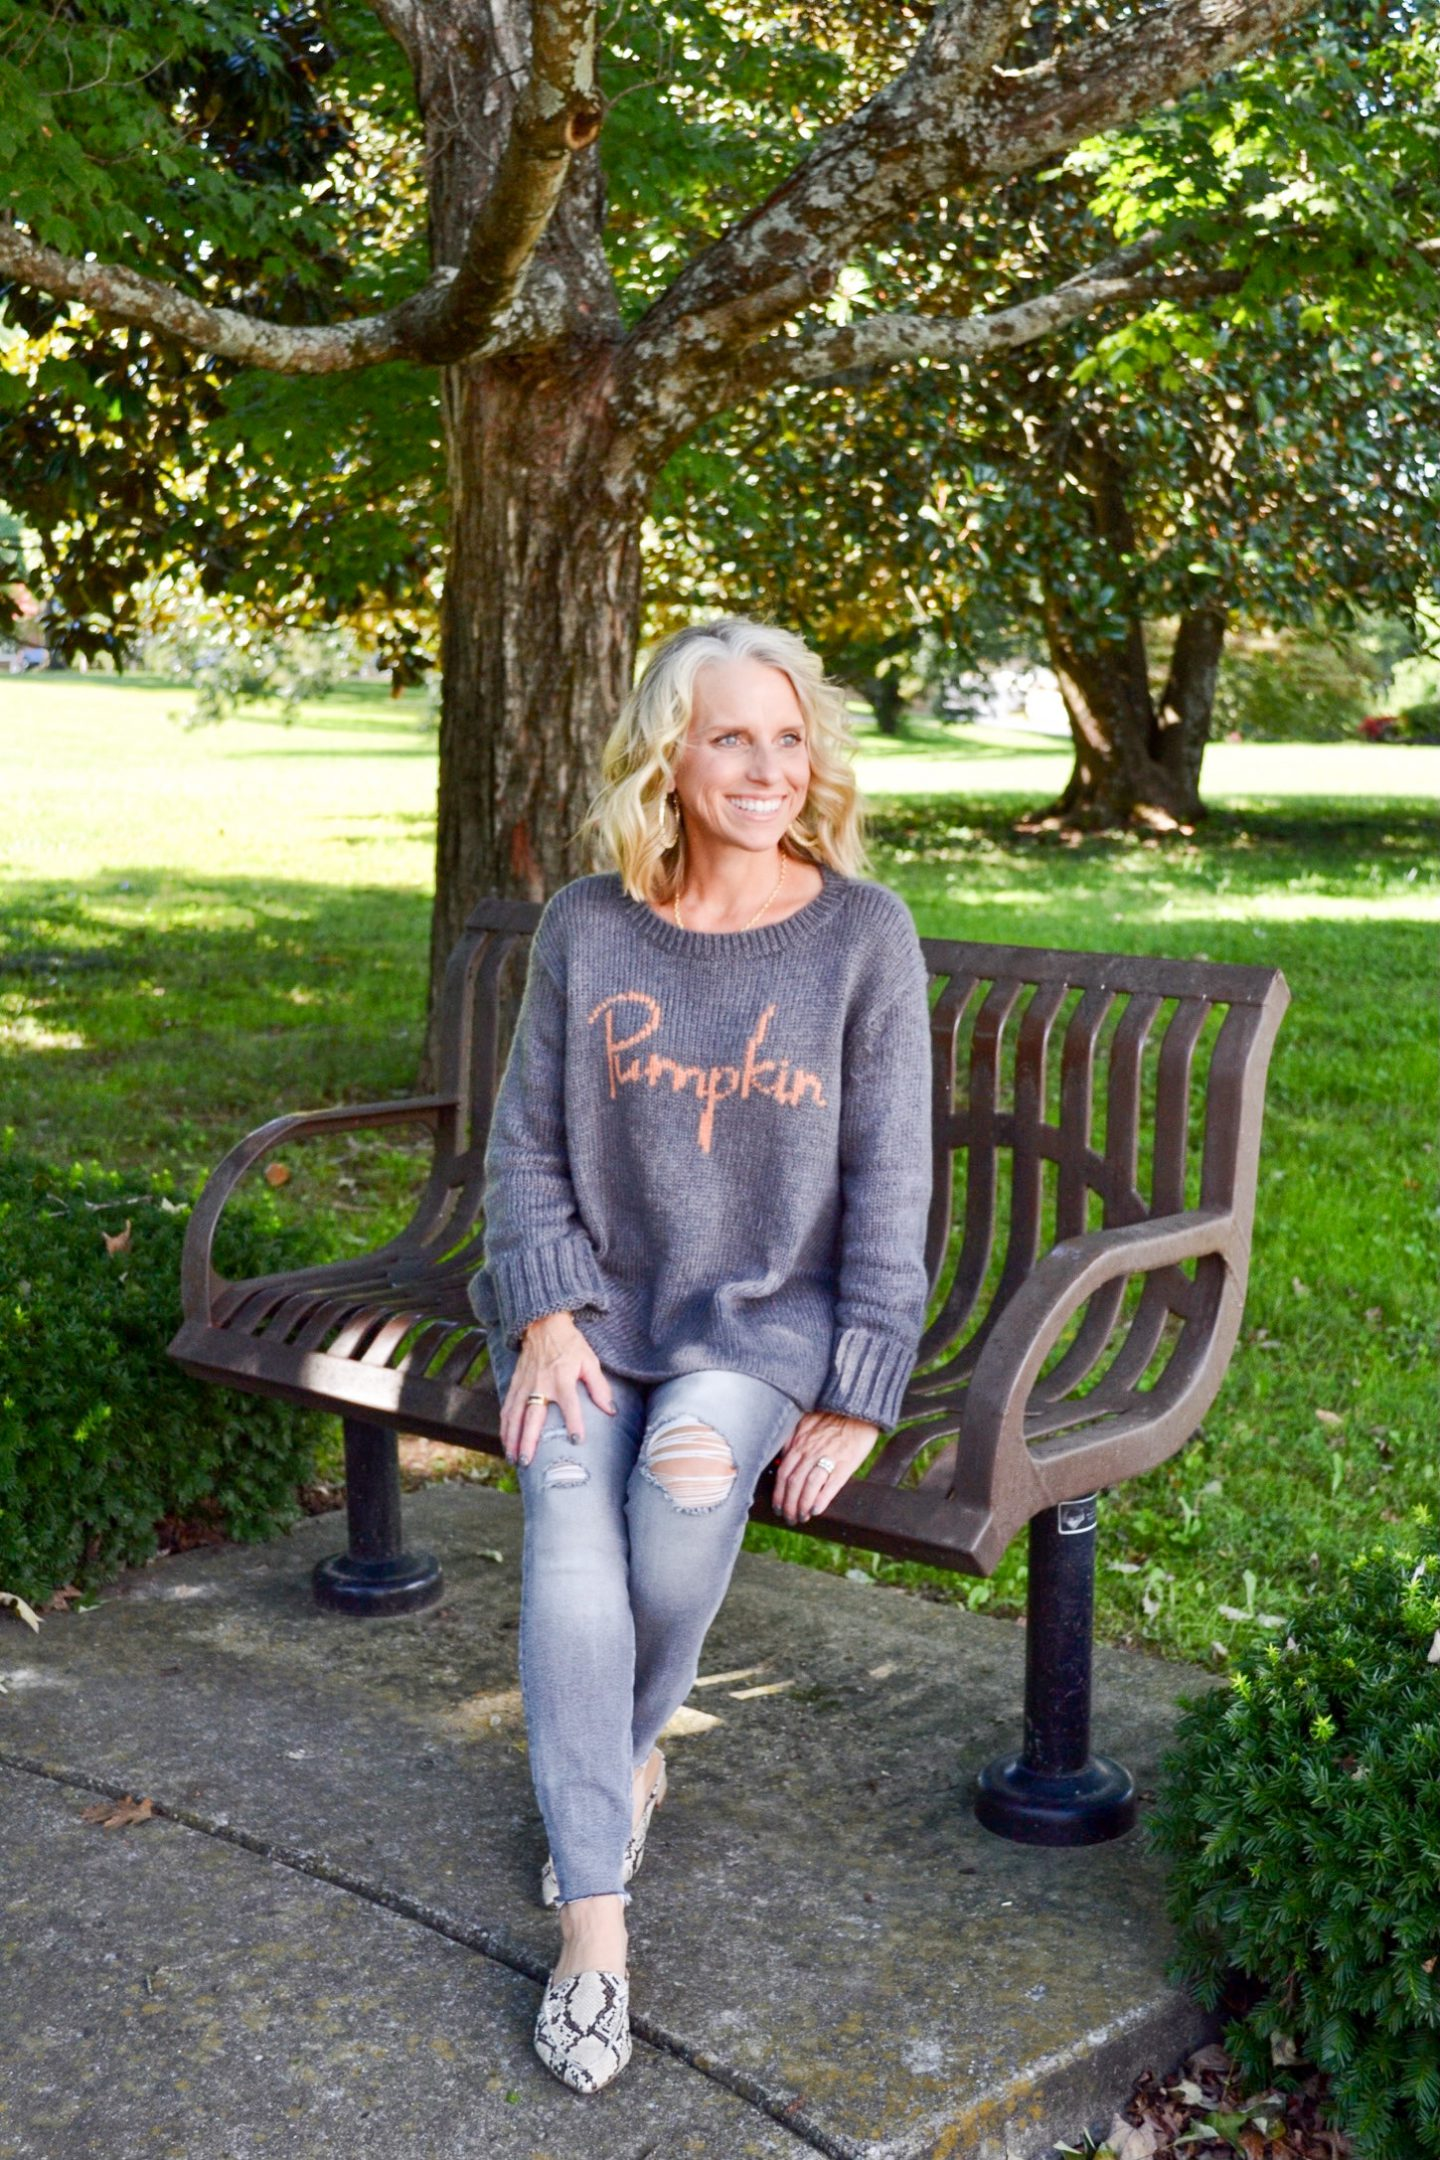 Perfect Pumpkin sweater